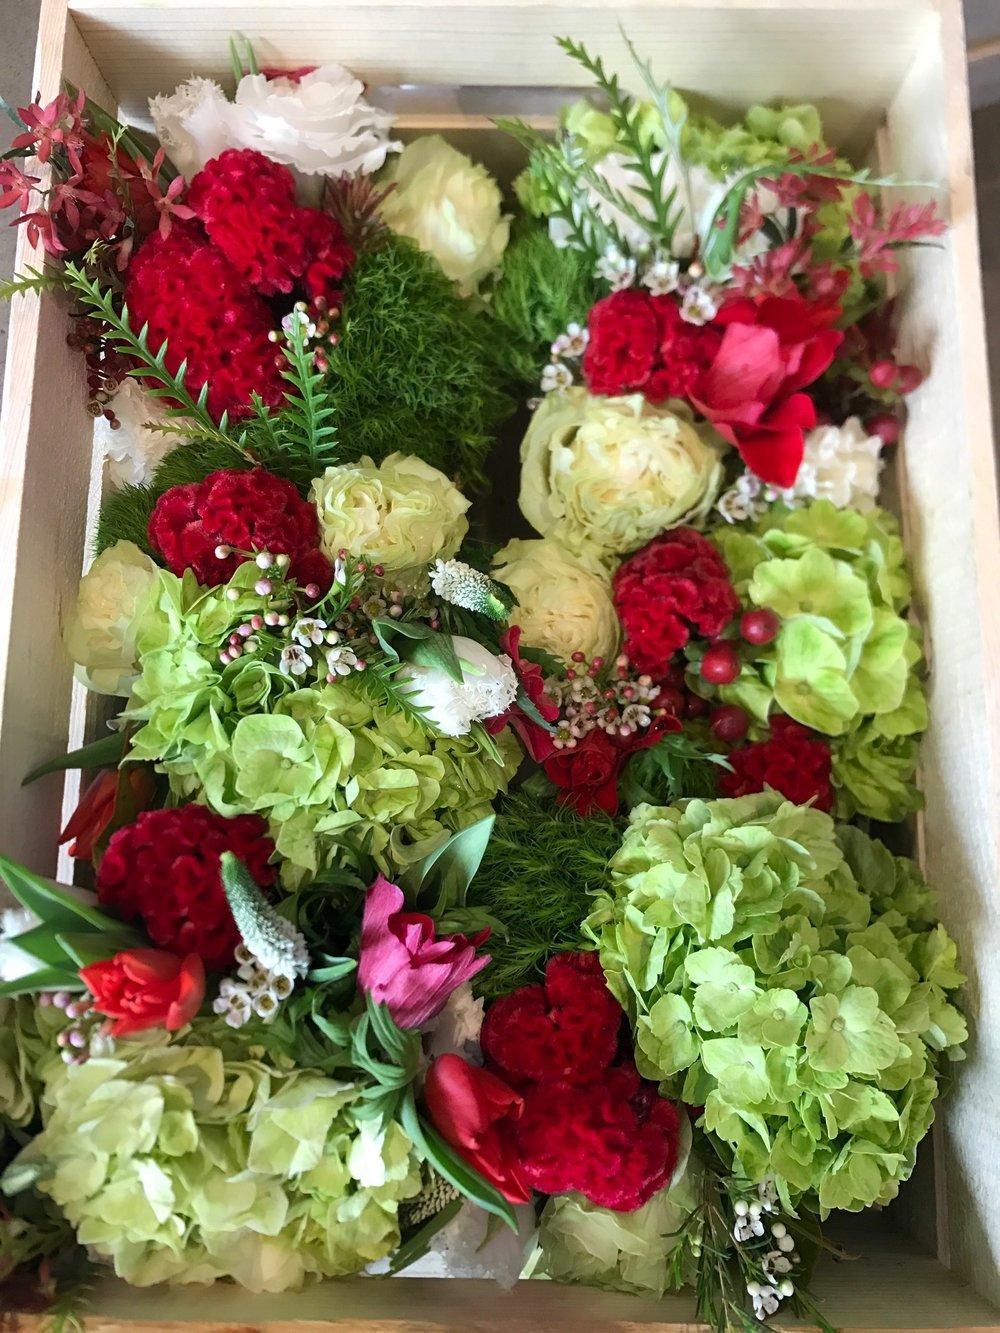 Private Event Florals, December 2016